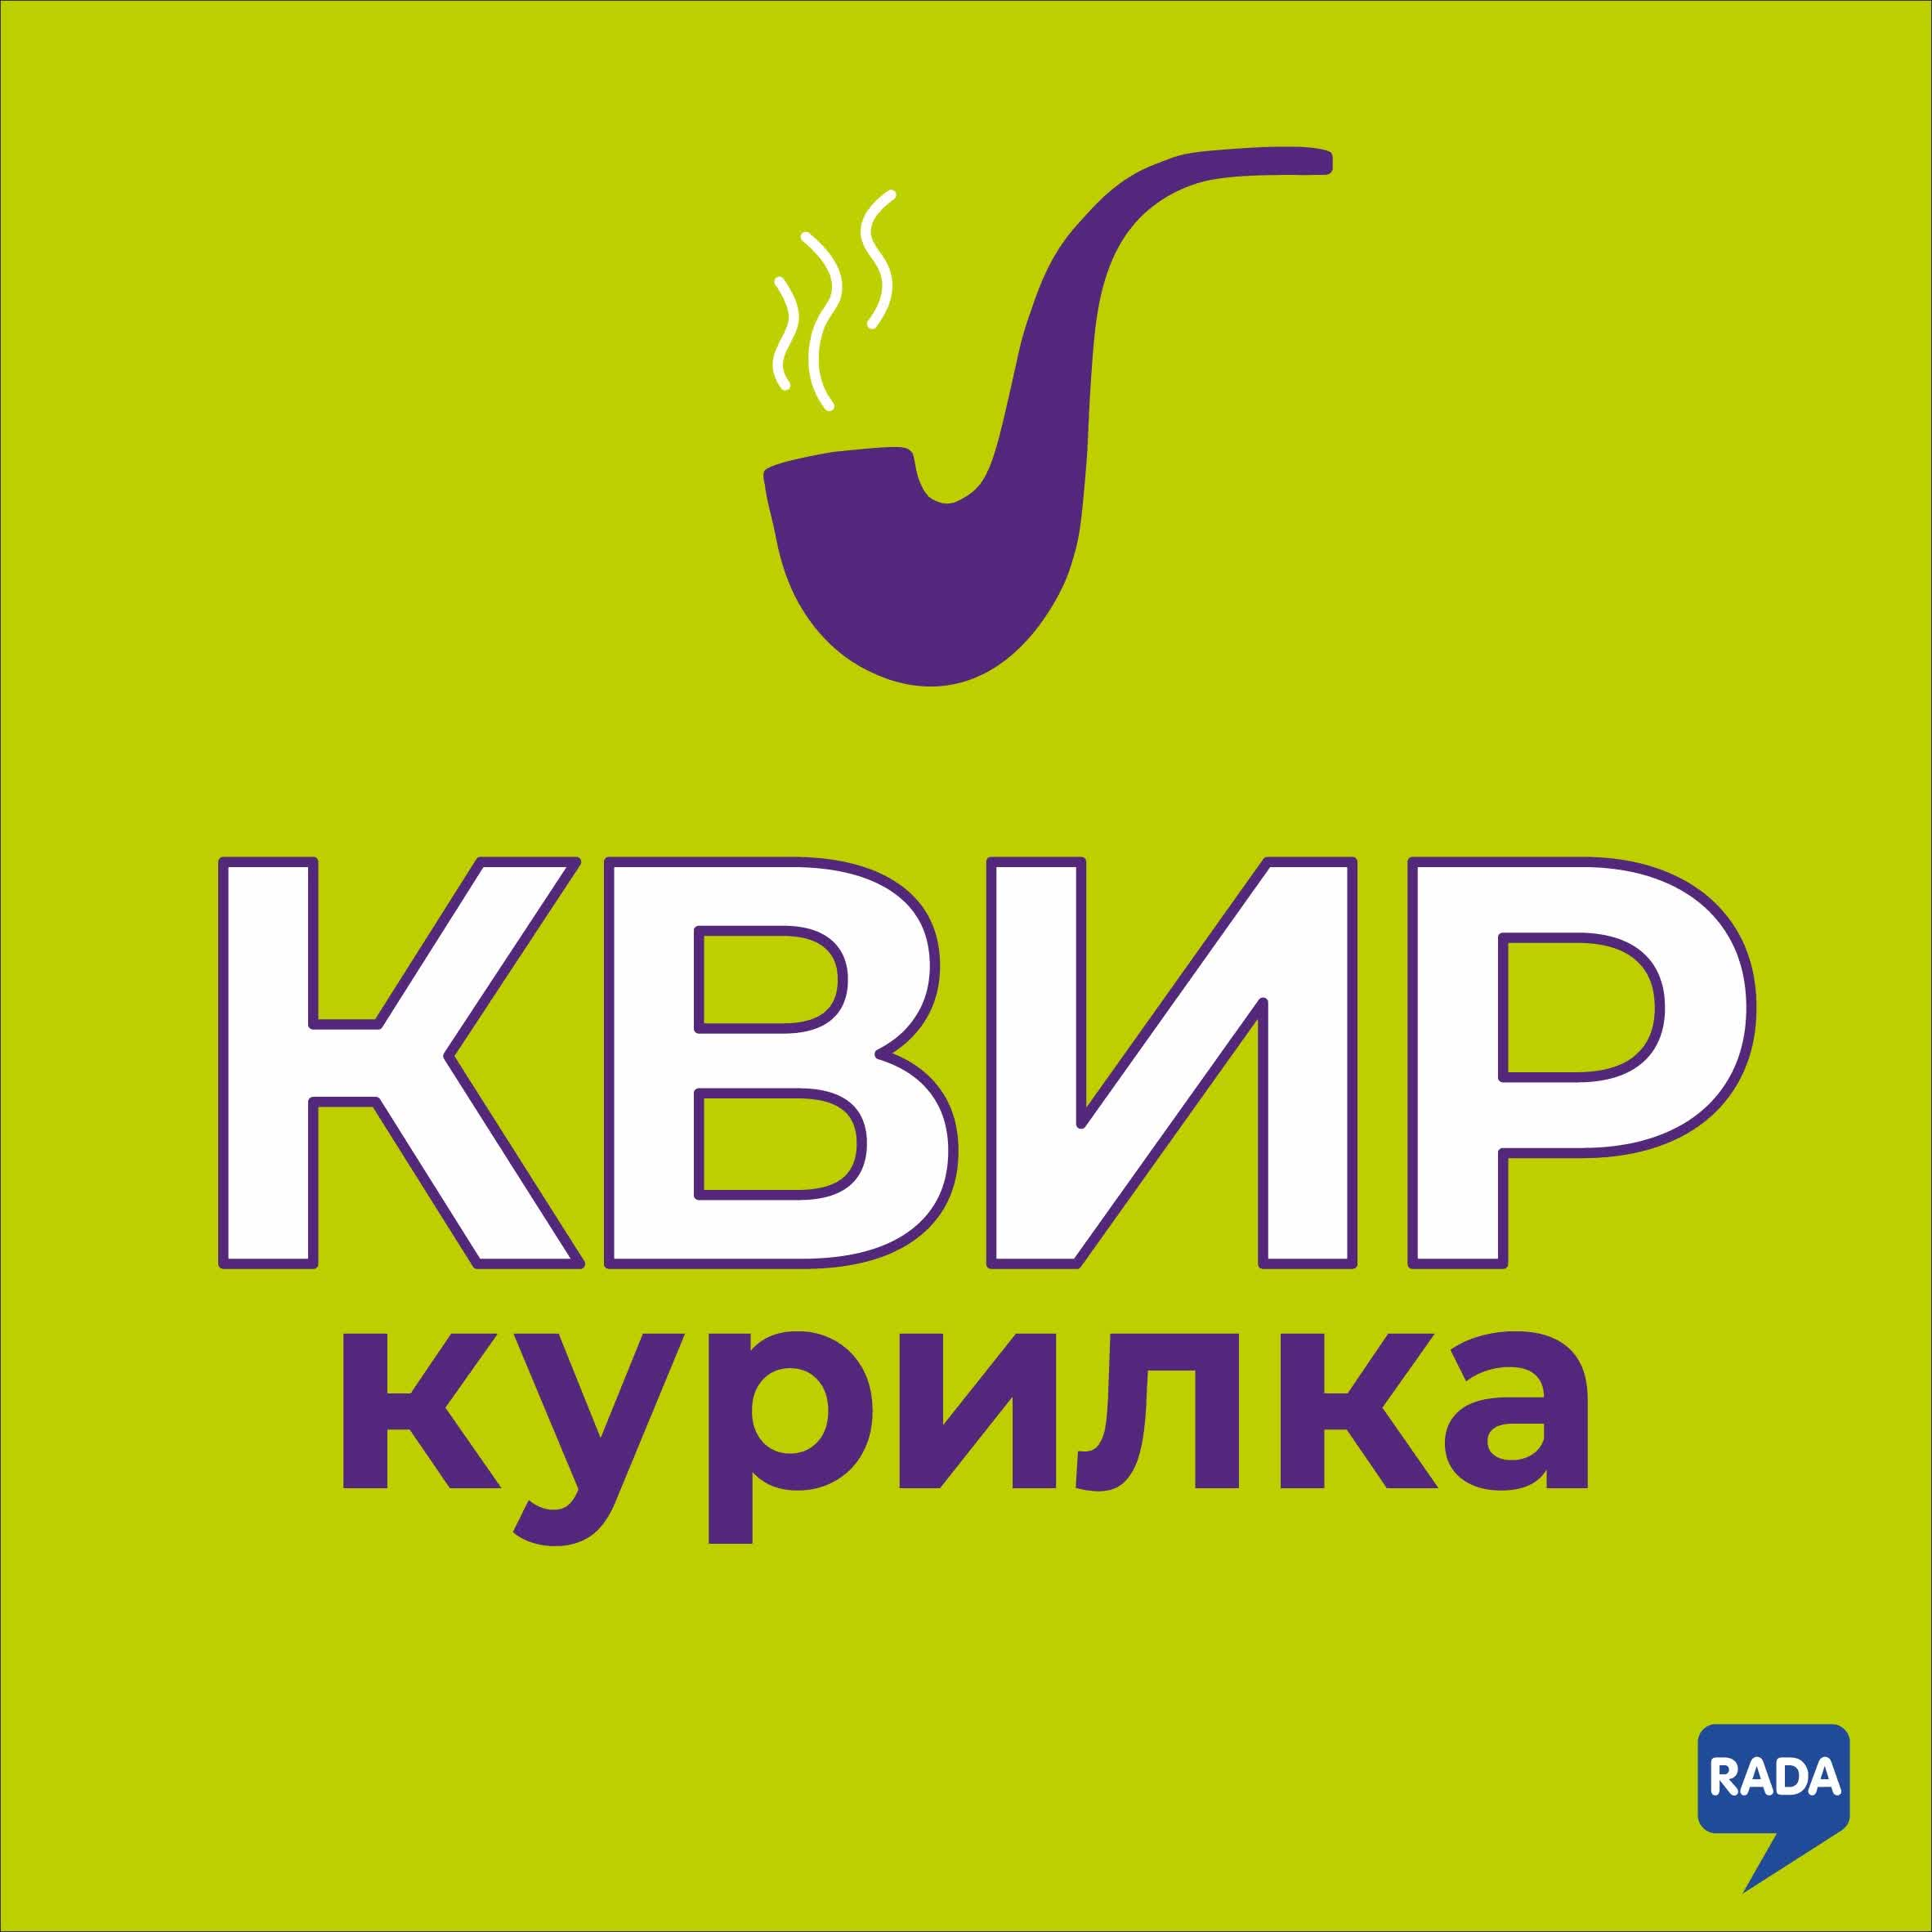 КВИР КУРИЛКА - Трейлер